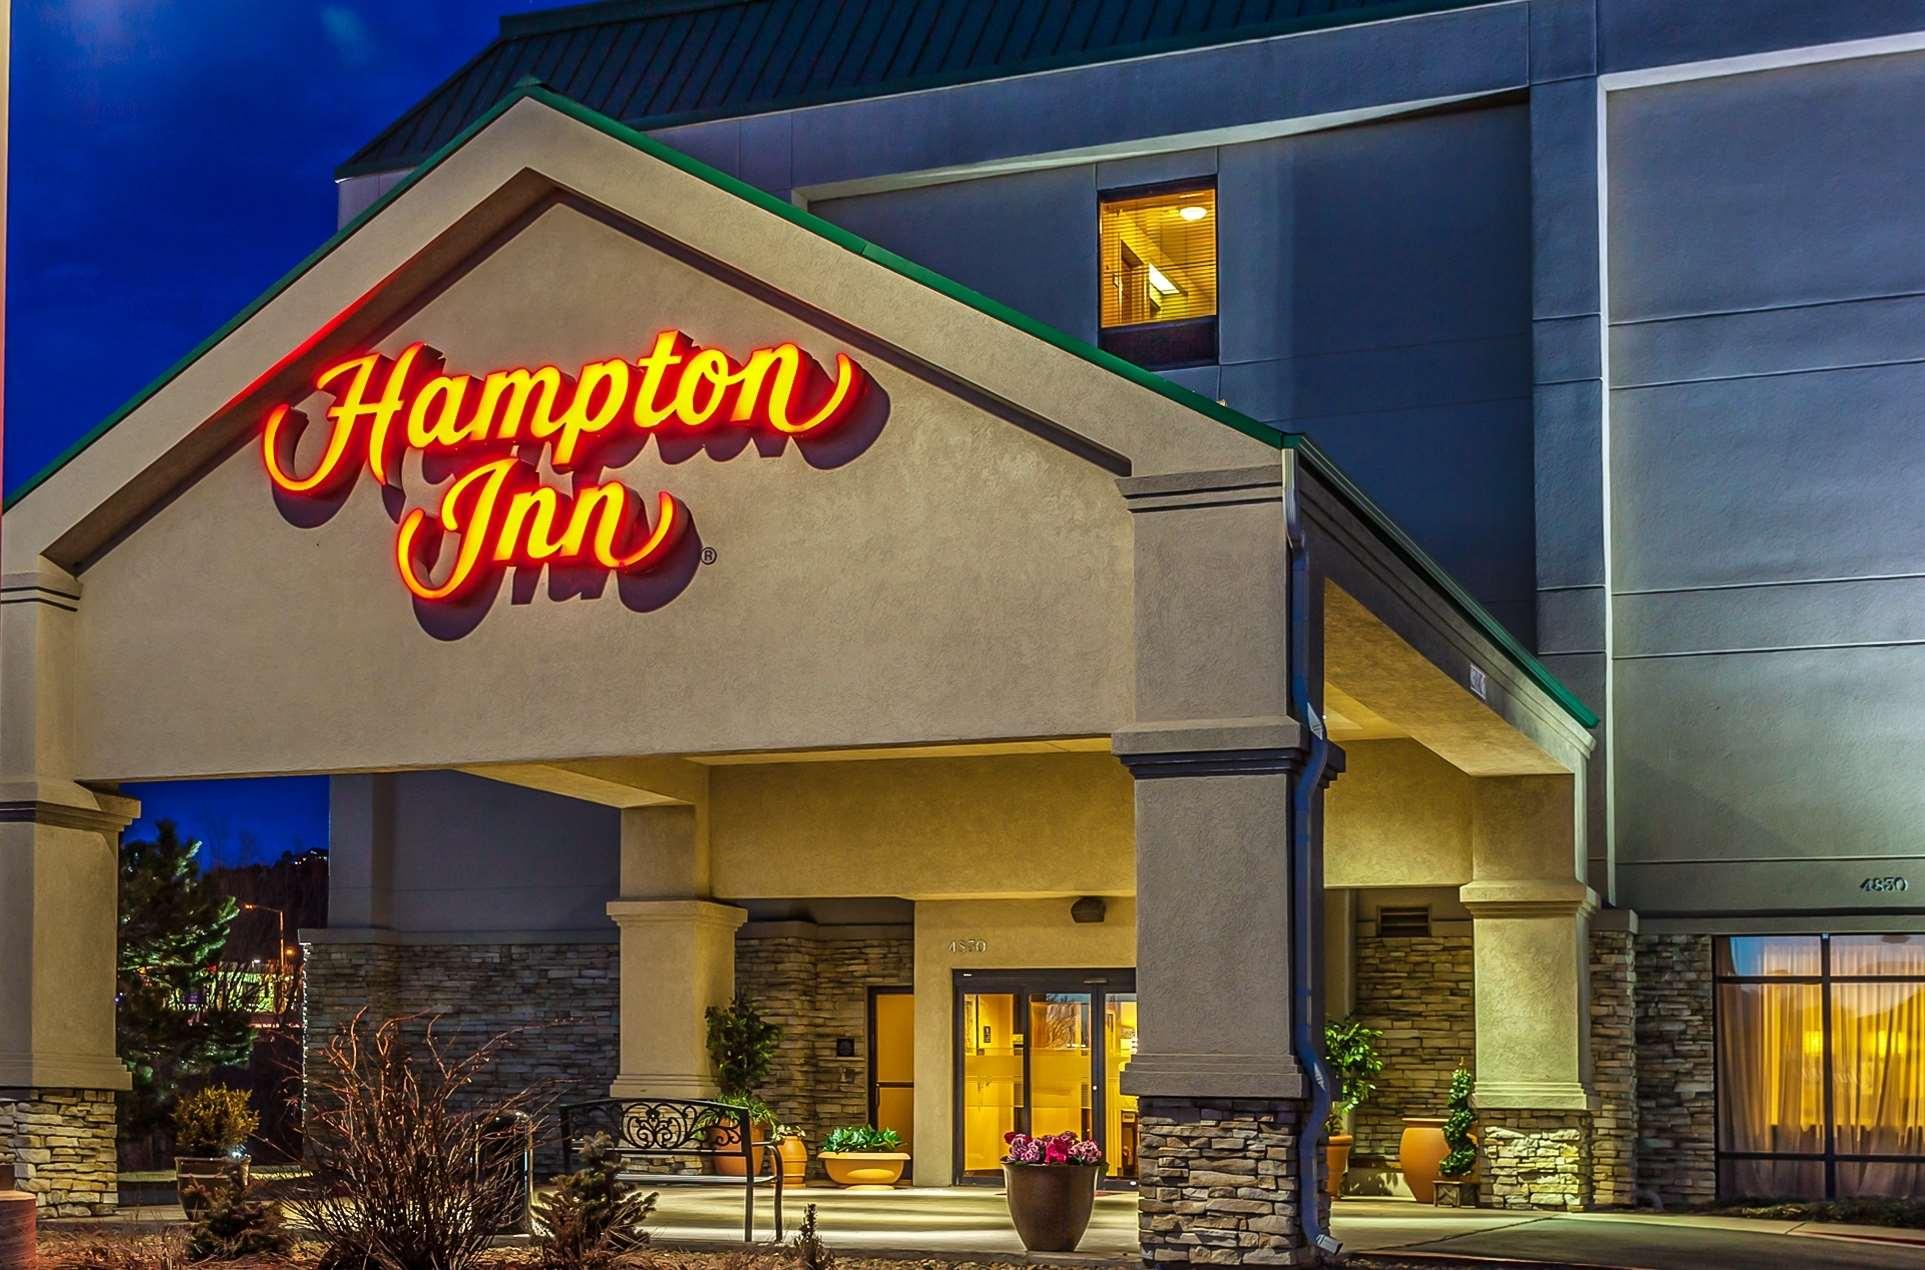 Hampton Inn Castle Rock image 0